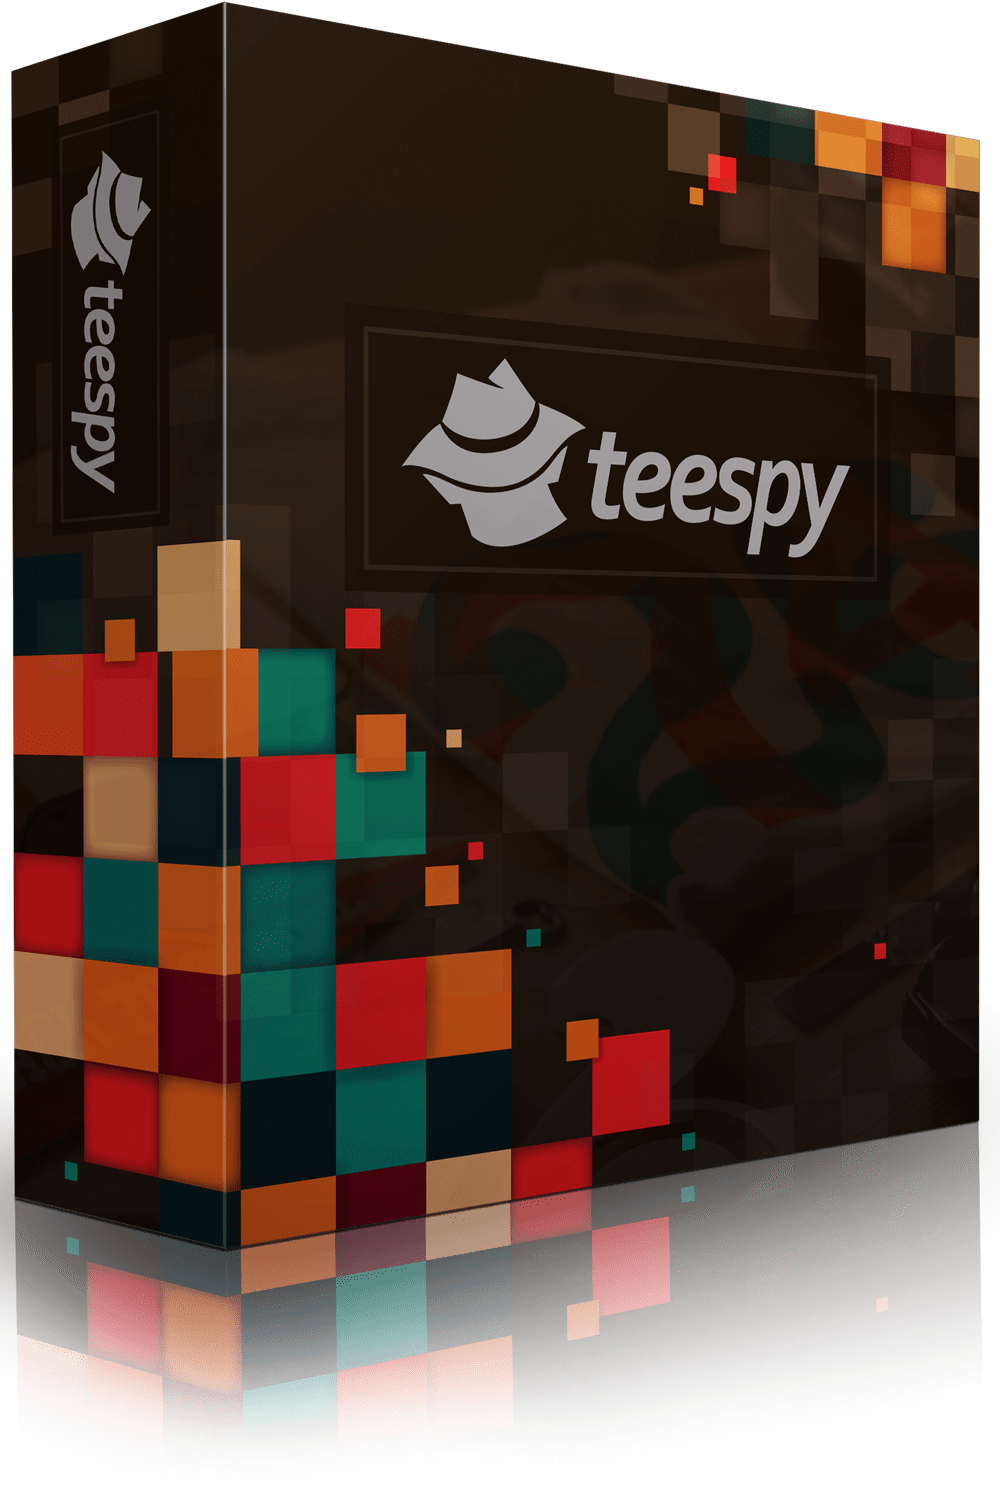 T-shirt Research Tool | Teespy